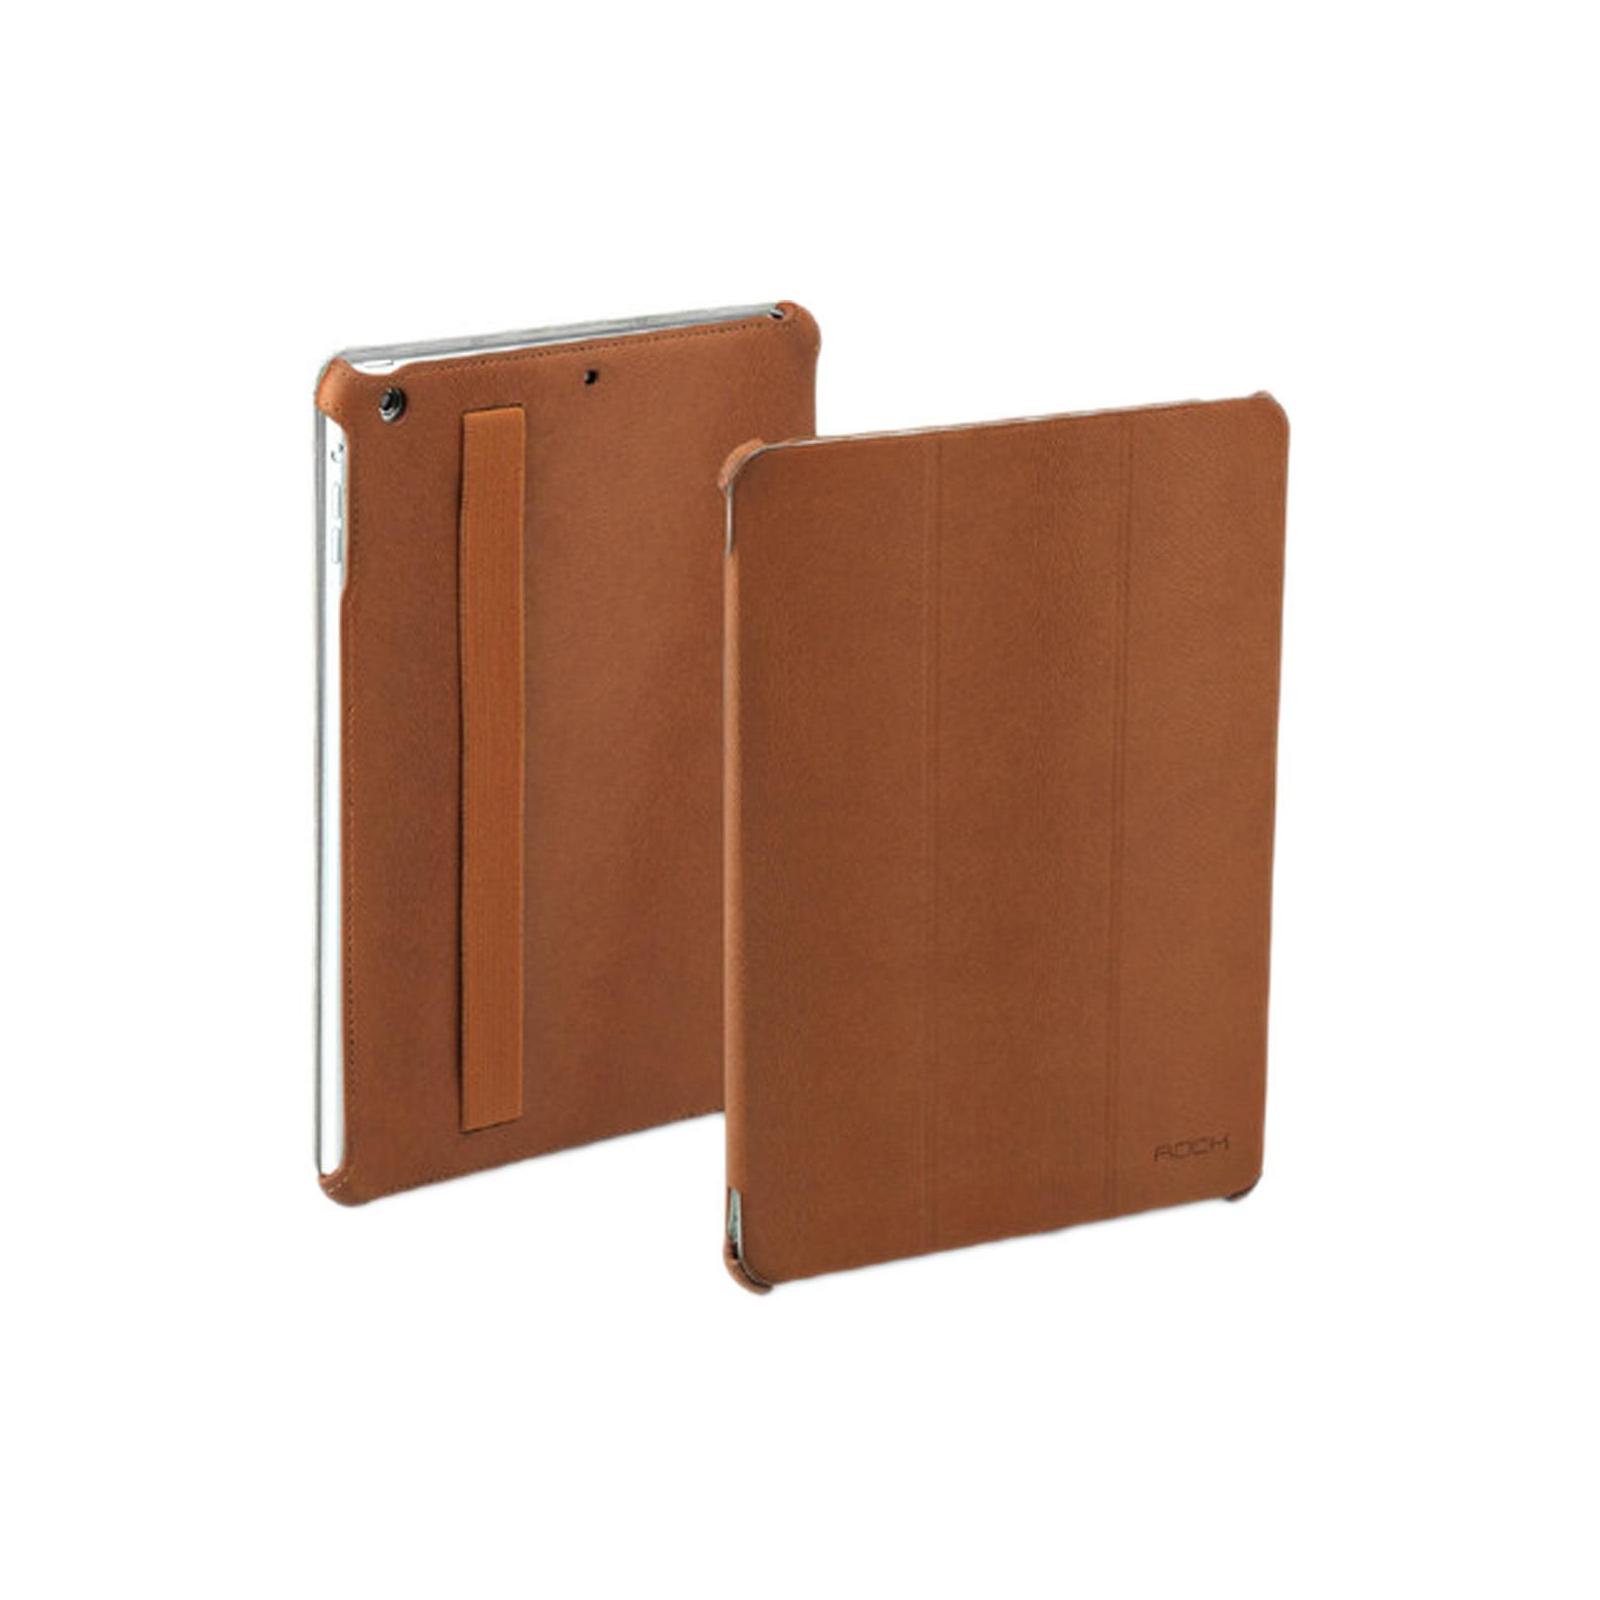 Чехол для планшета Rock texture series iPad Air coffee (iPad Air-57481) изображение 2